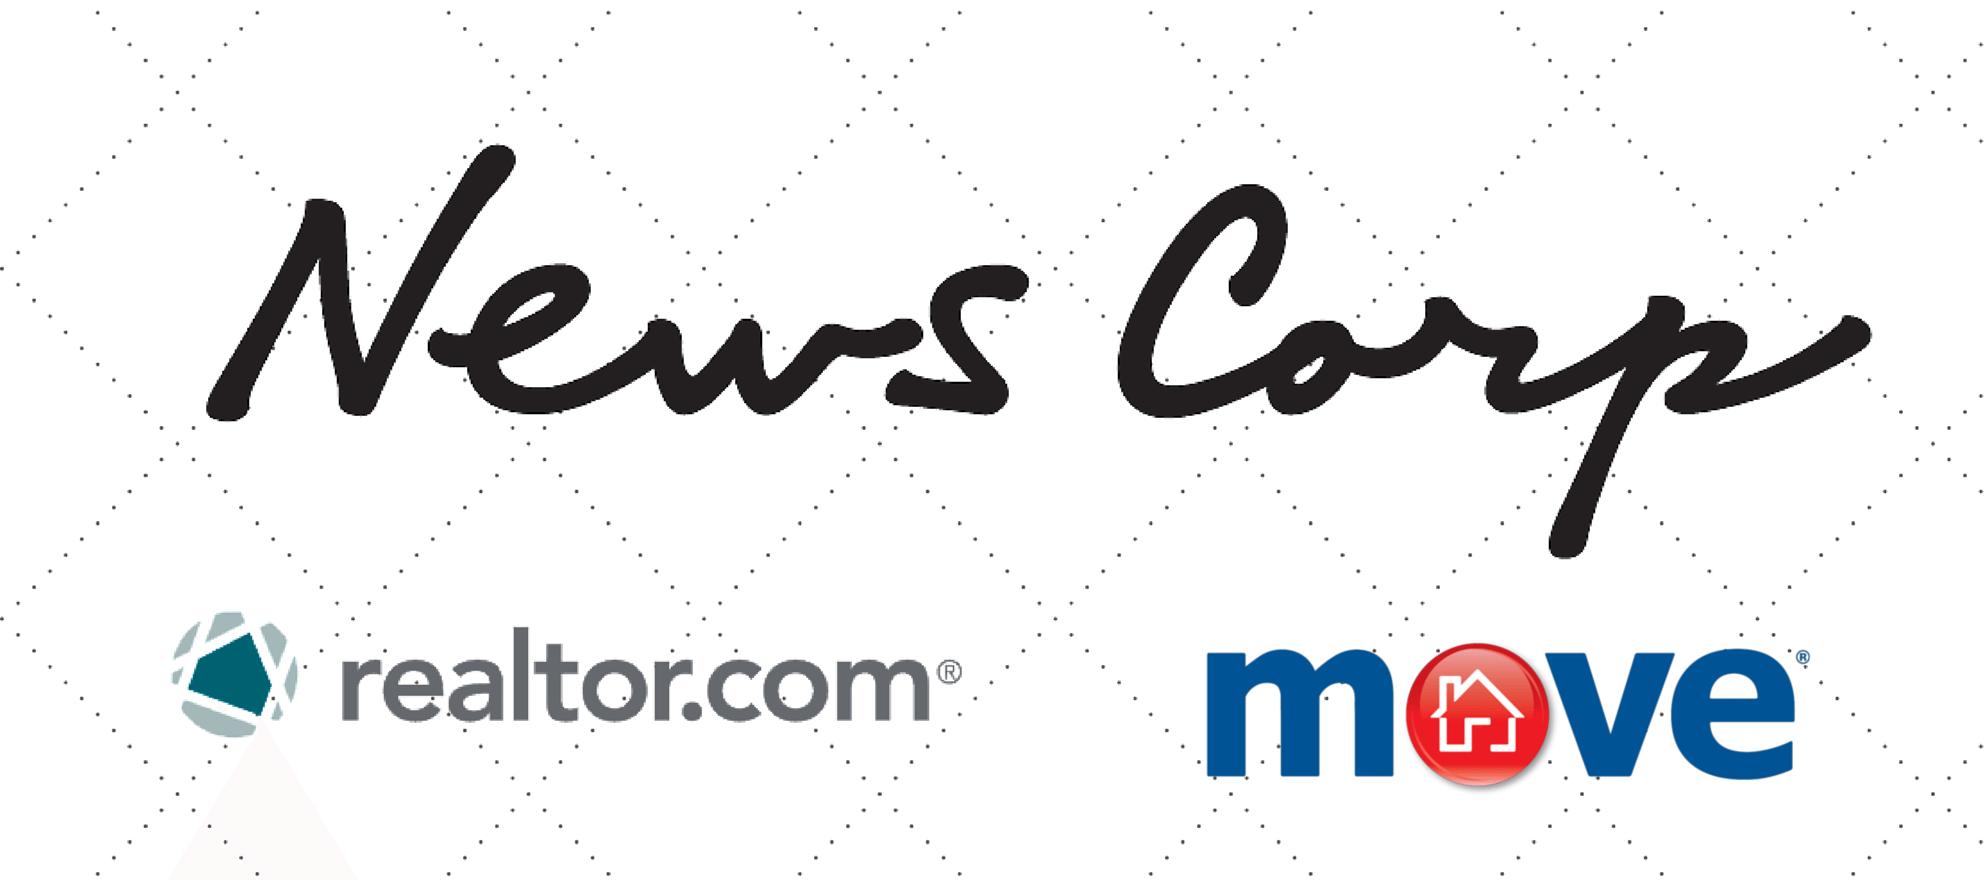 Realtor.com will make 'simple product improvements' before exploring 'big, bold ideas'